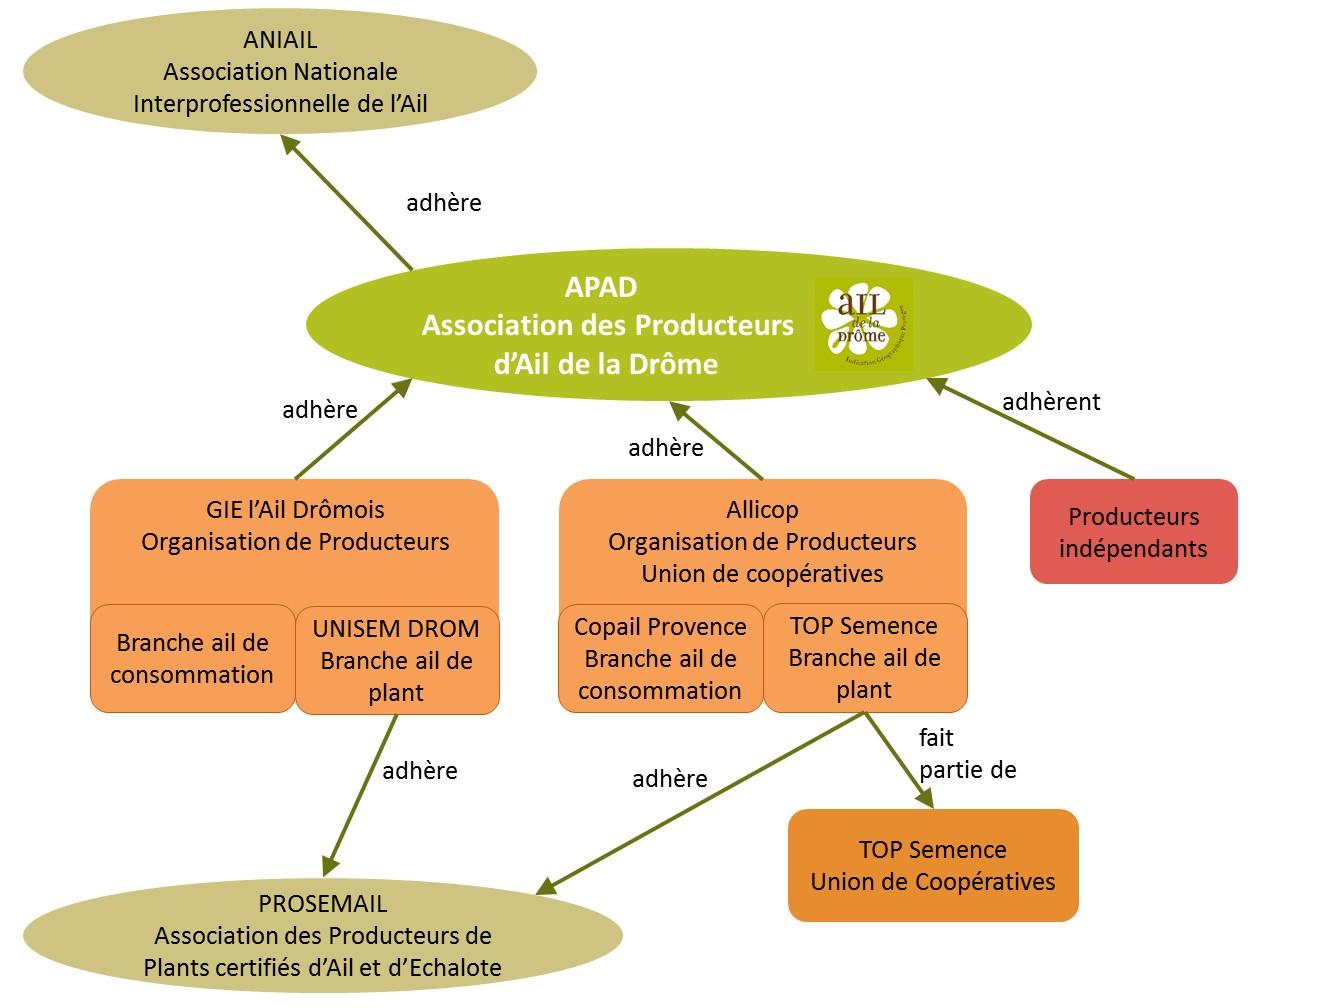 Organigramme APAD & filière